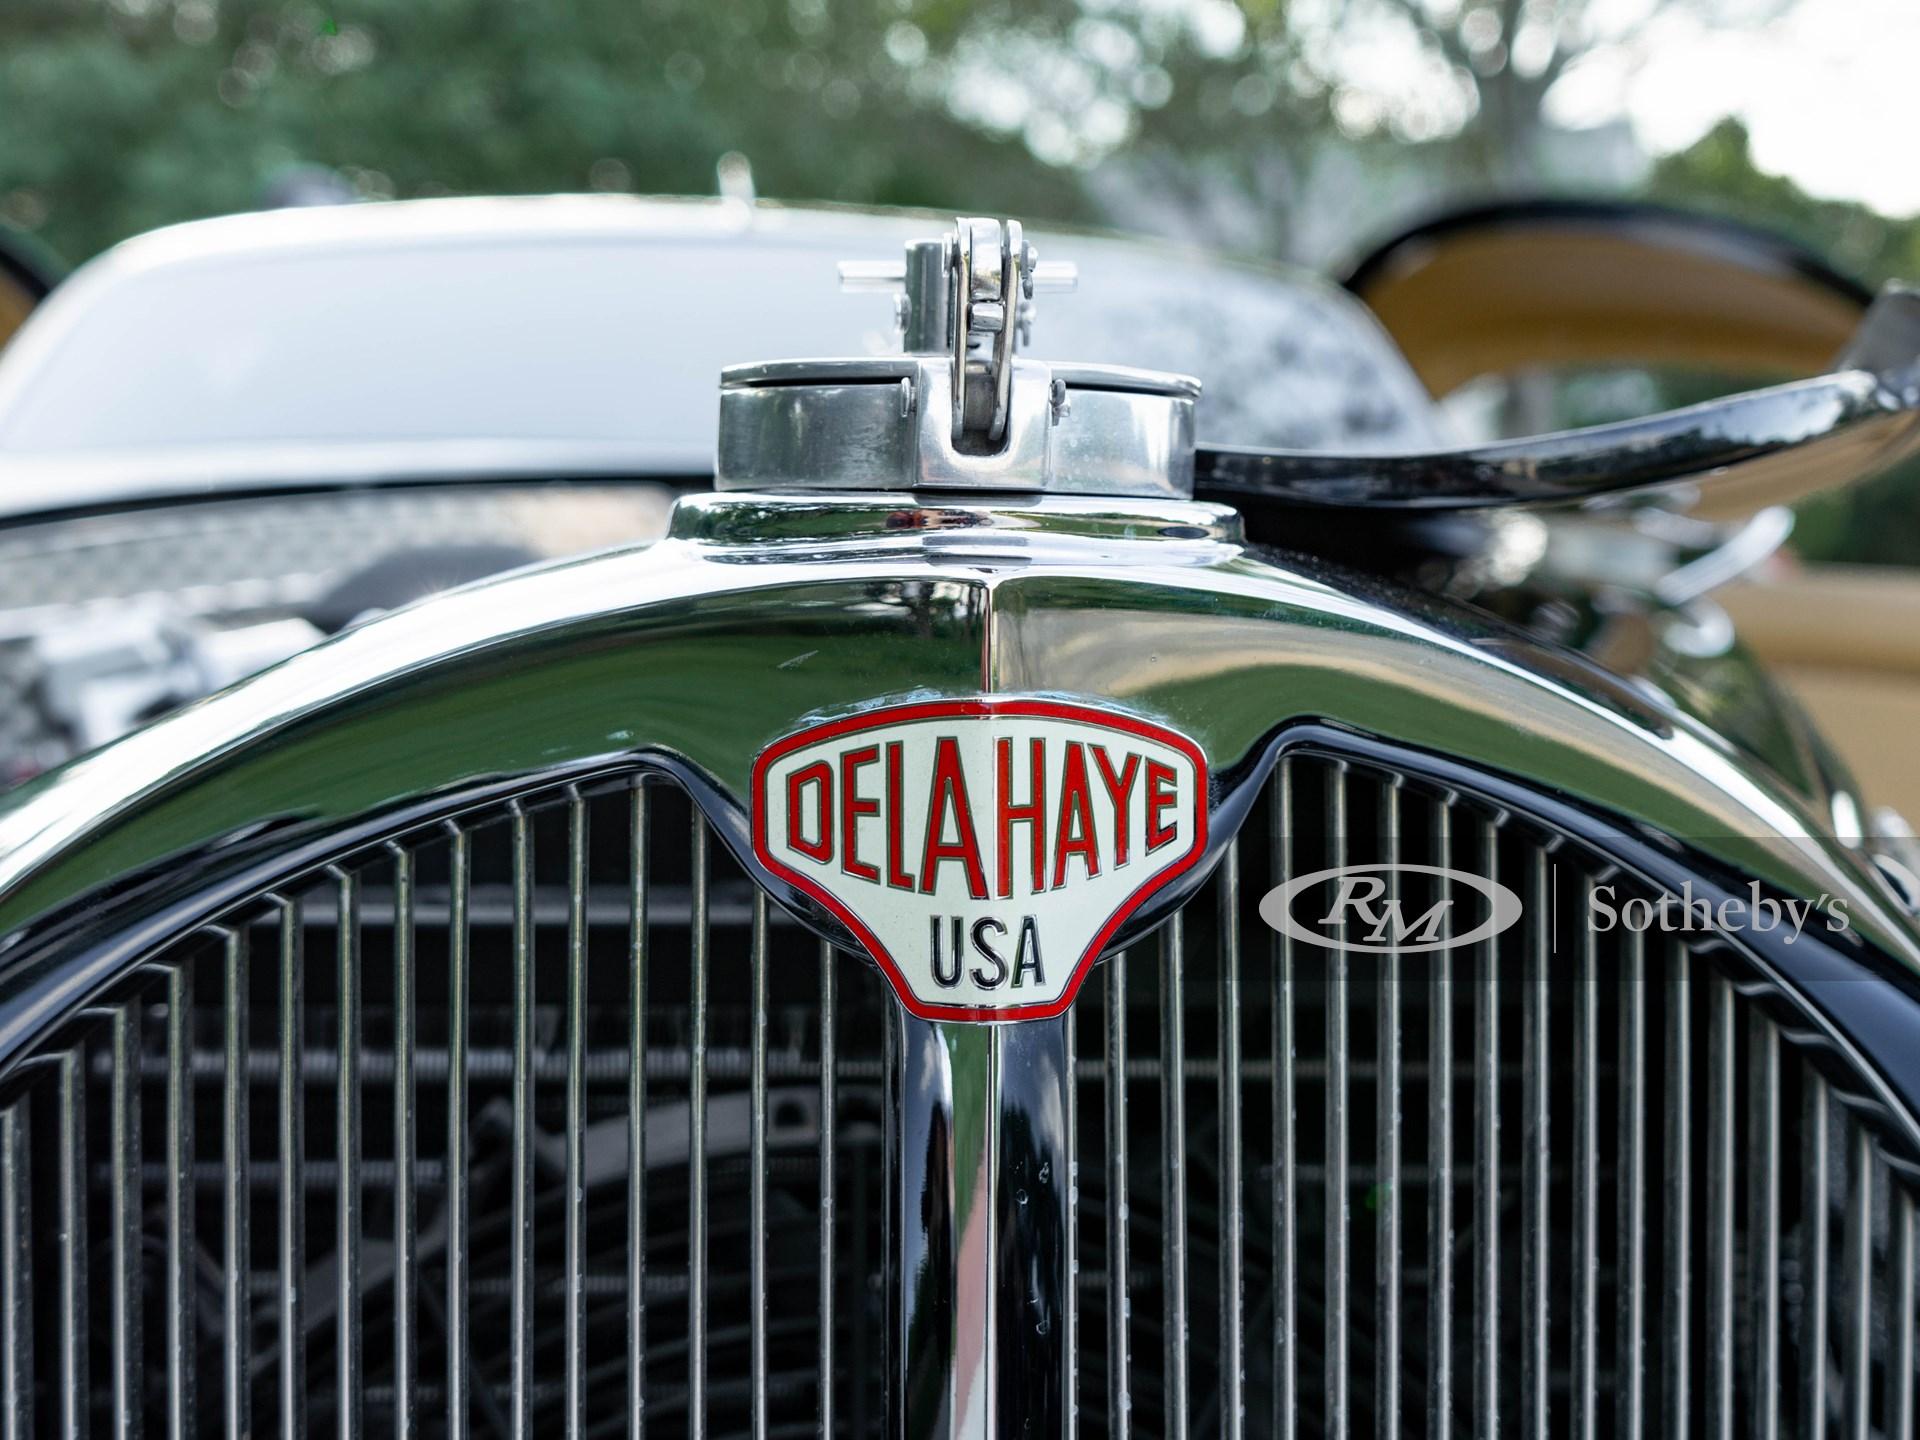 1939 Delahaye USA Pacific  -